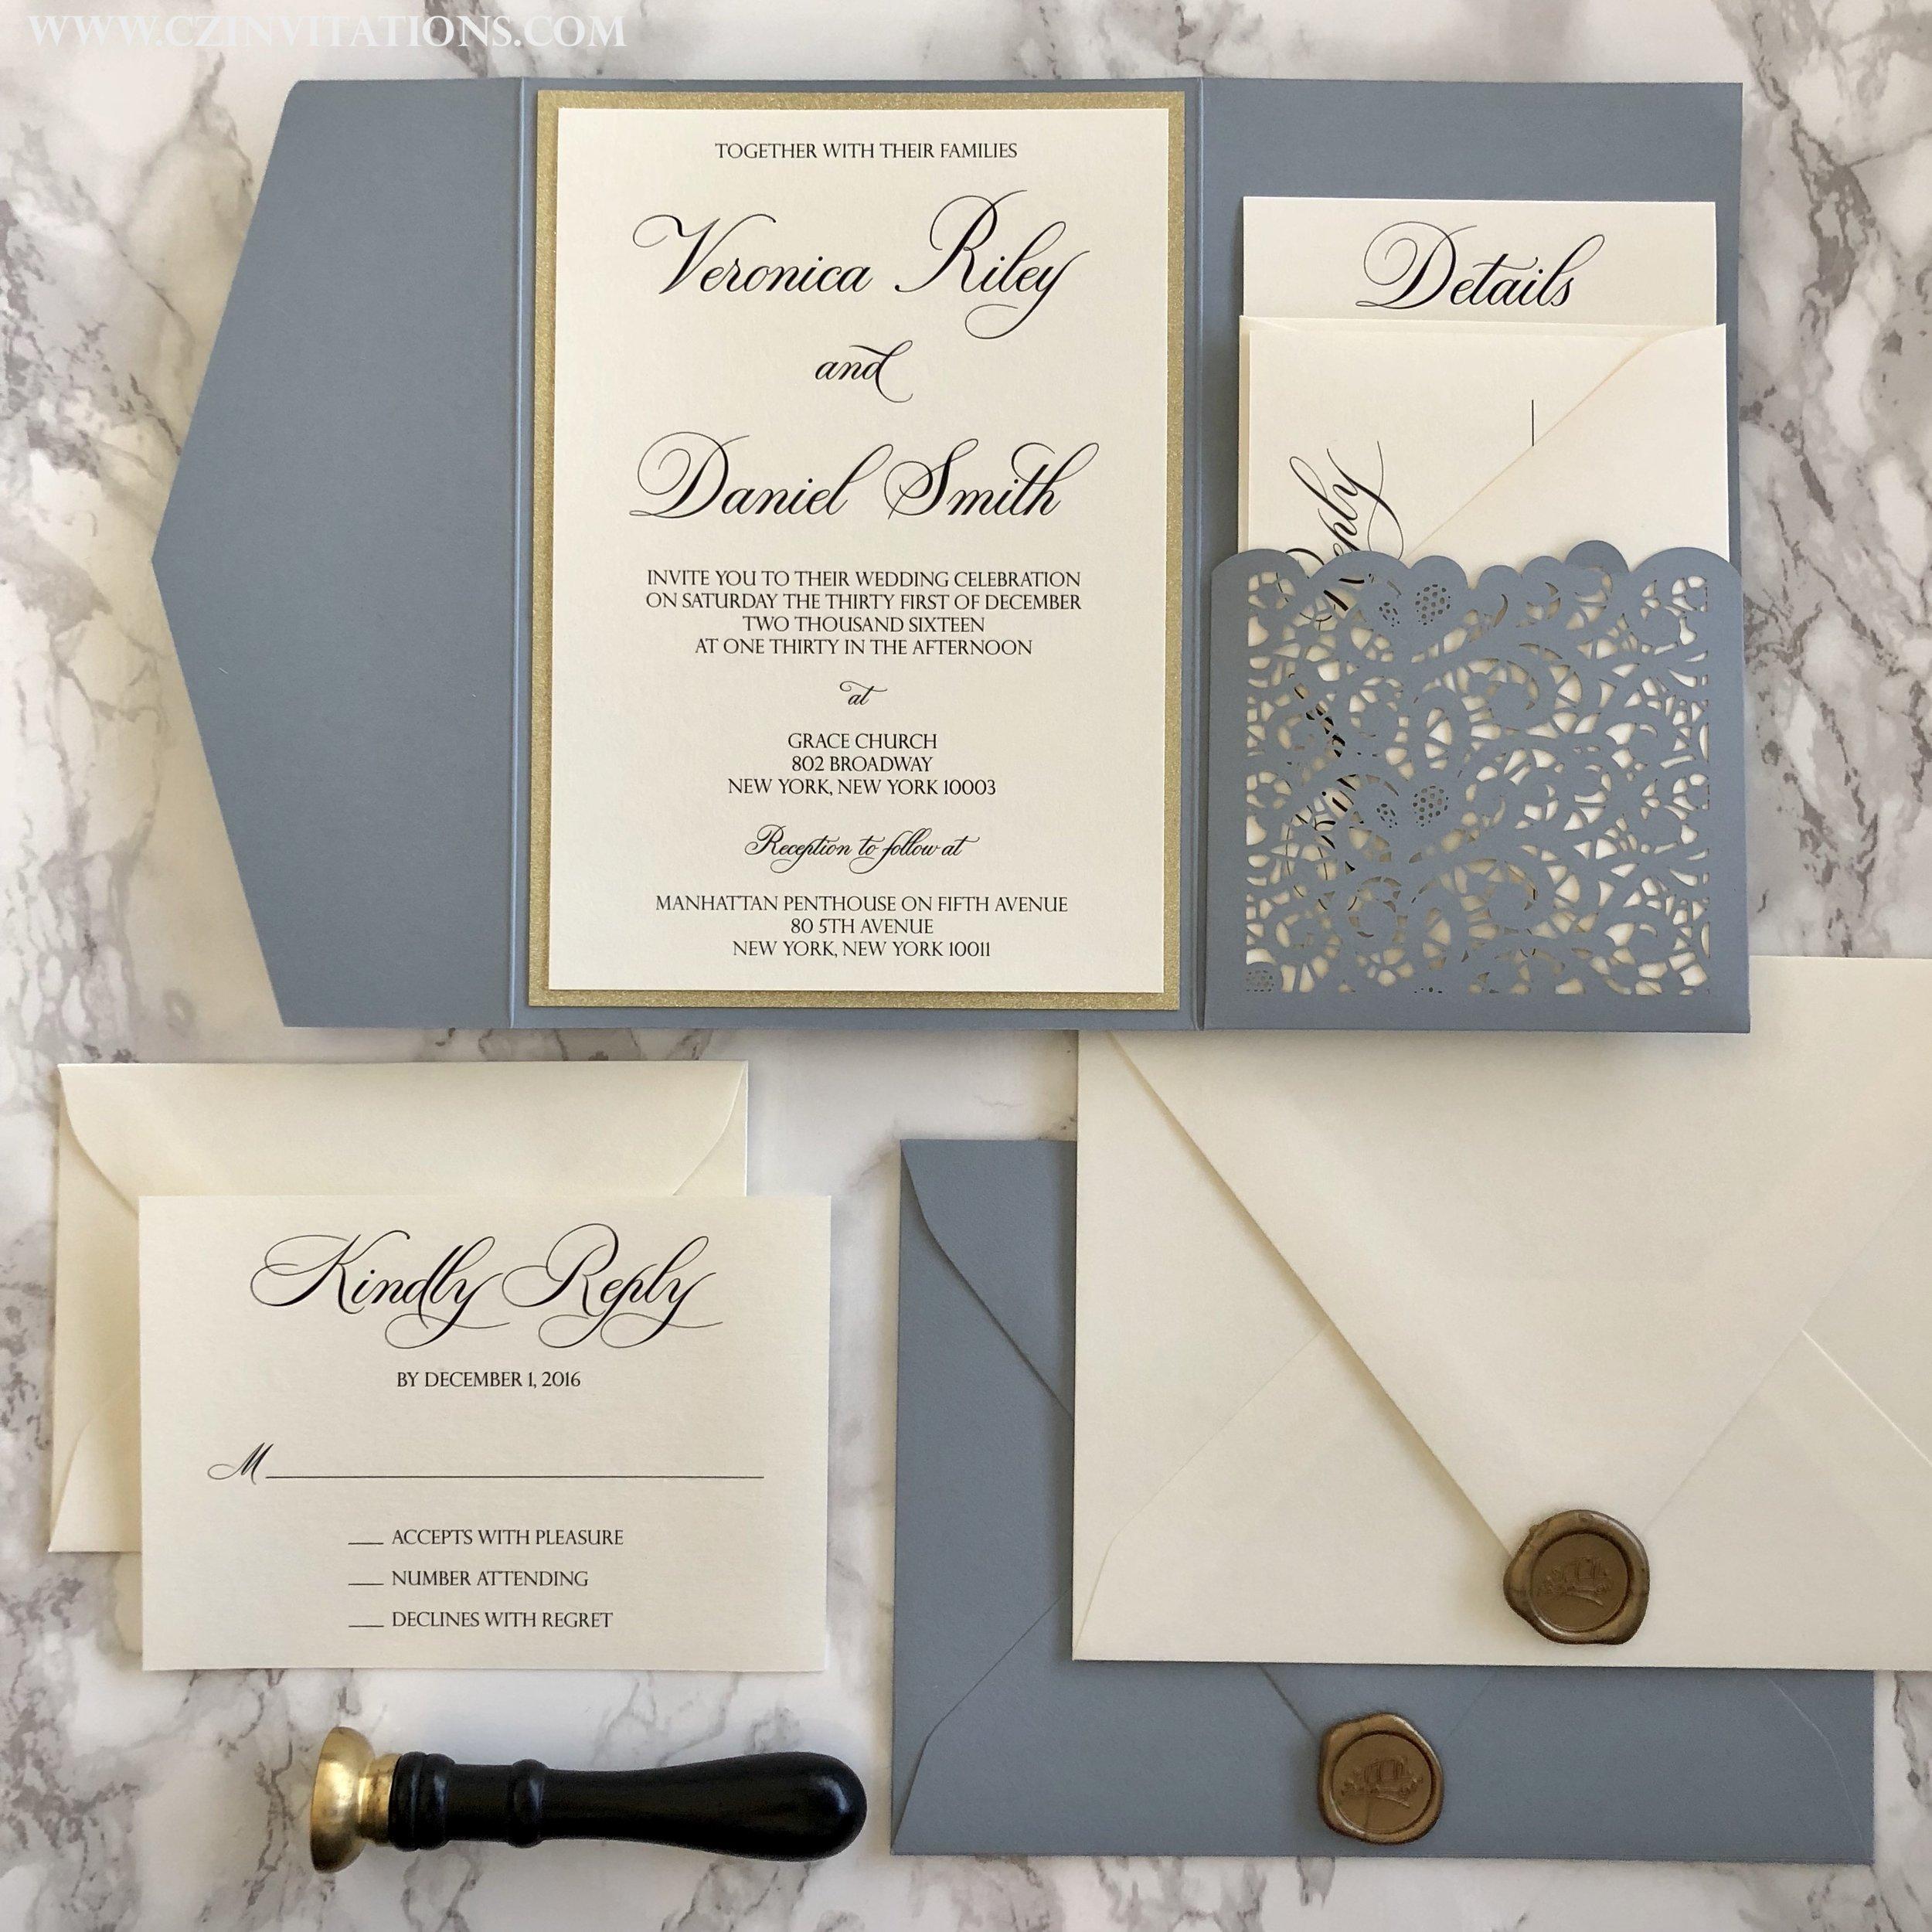 Dusty Blue Laser Cut Pocket Wedding Invitation In Silver Or Gold Glitter Cz Invitations